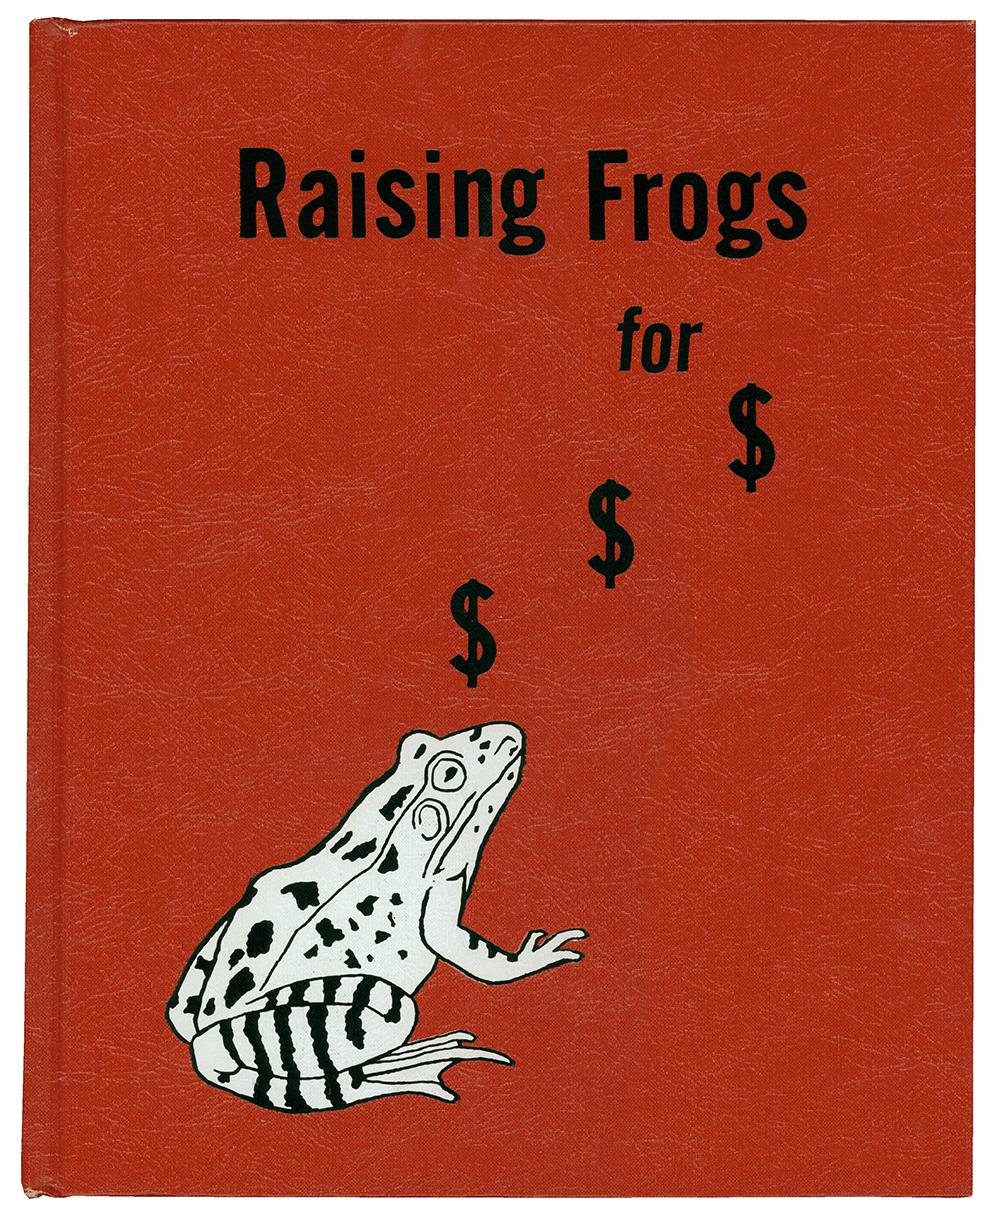 frog_cover_highres.jpg